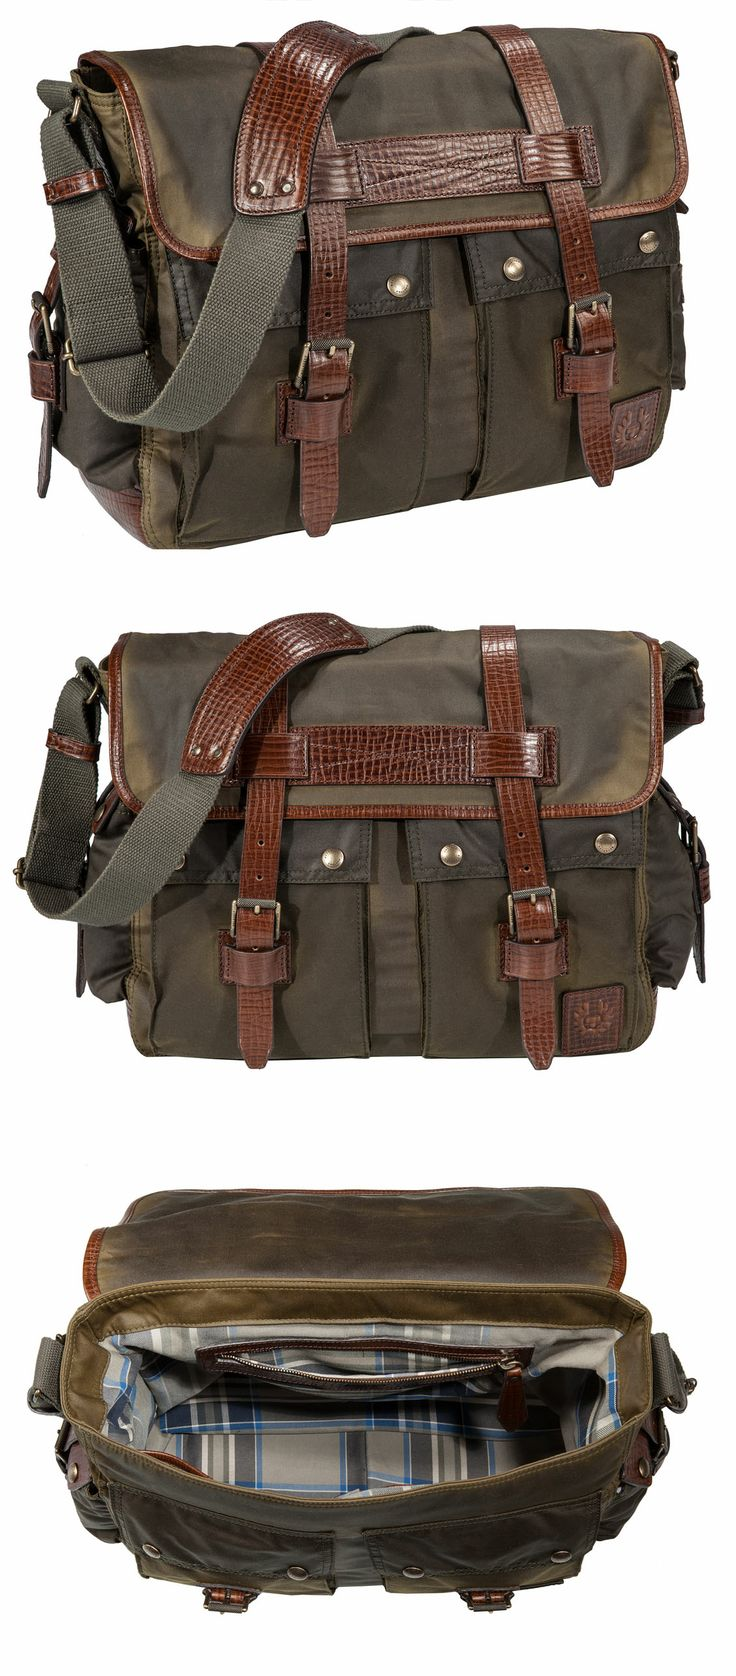 Belstaff bag BROMFIELD http://www.eckerle.de/accessoires/taschen/